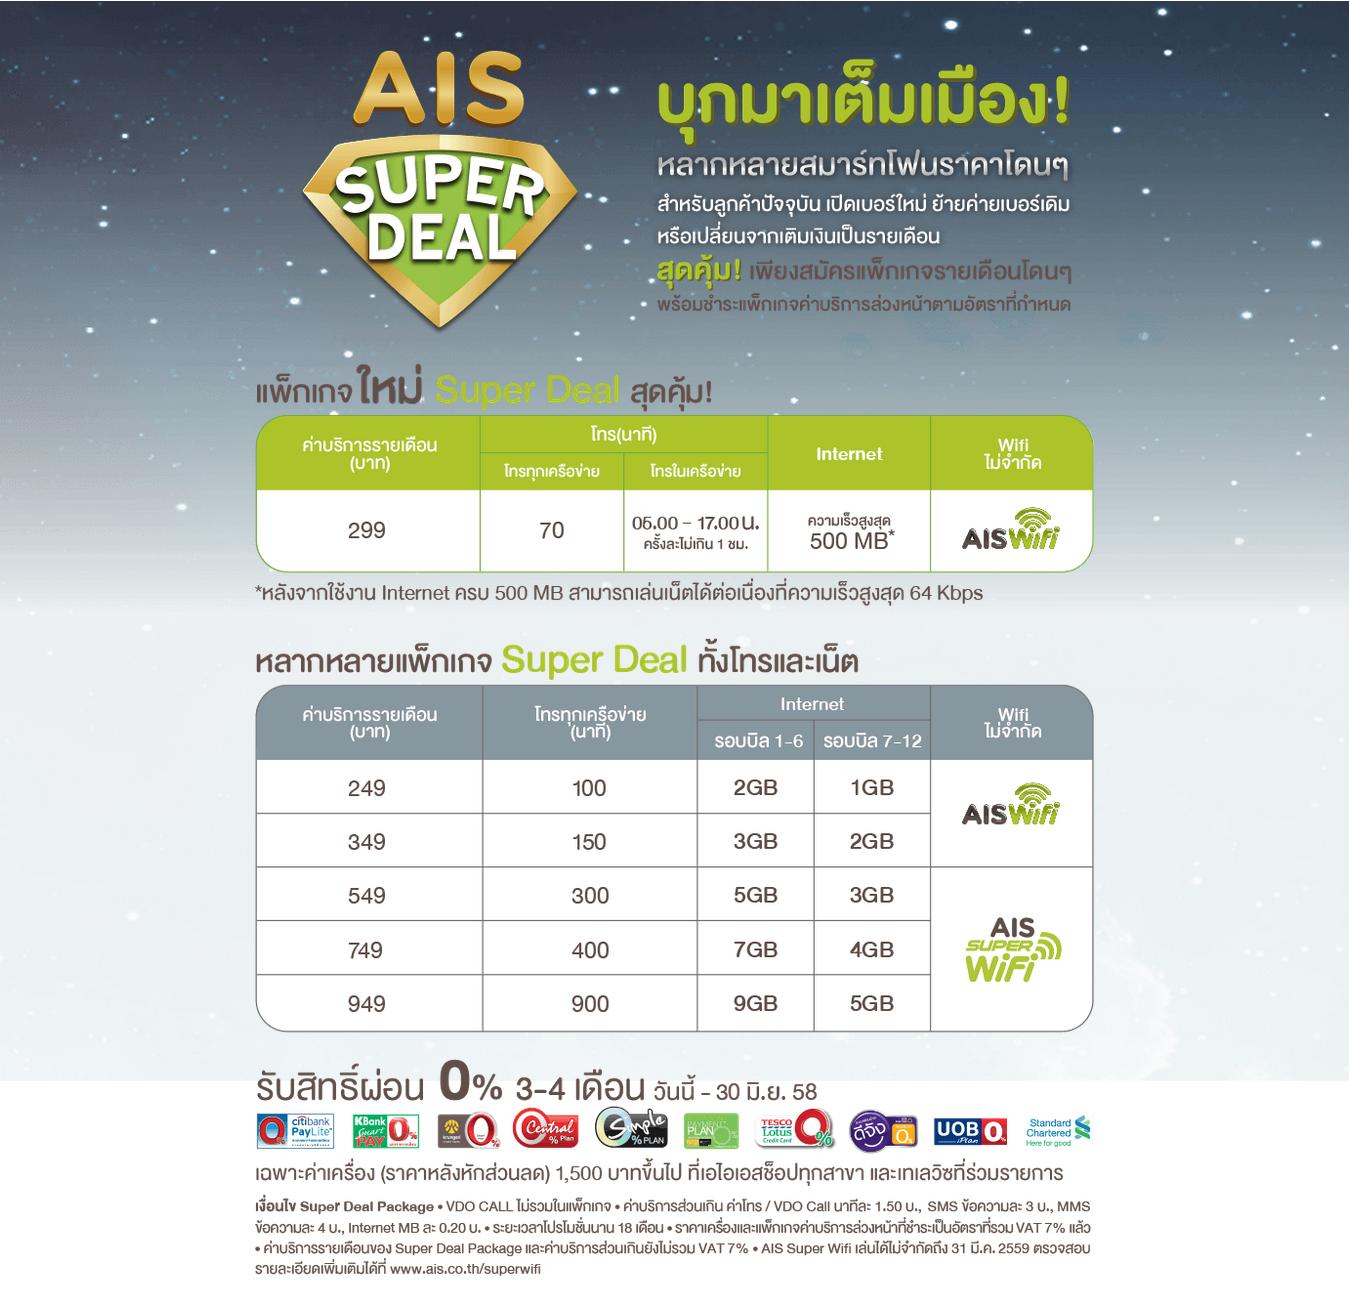 AIS Super Deal   บุกมาเต็มเมือง หลากหลายสมาร์ทโฟน ราคาโดนๆ2